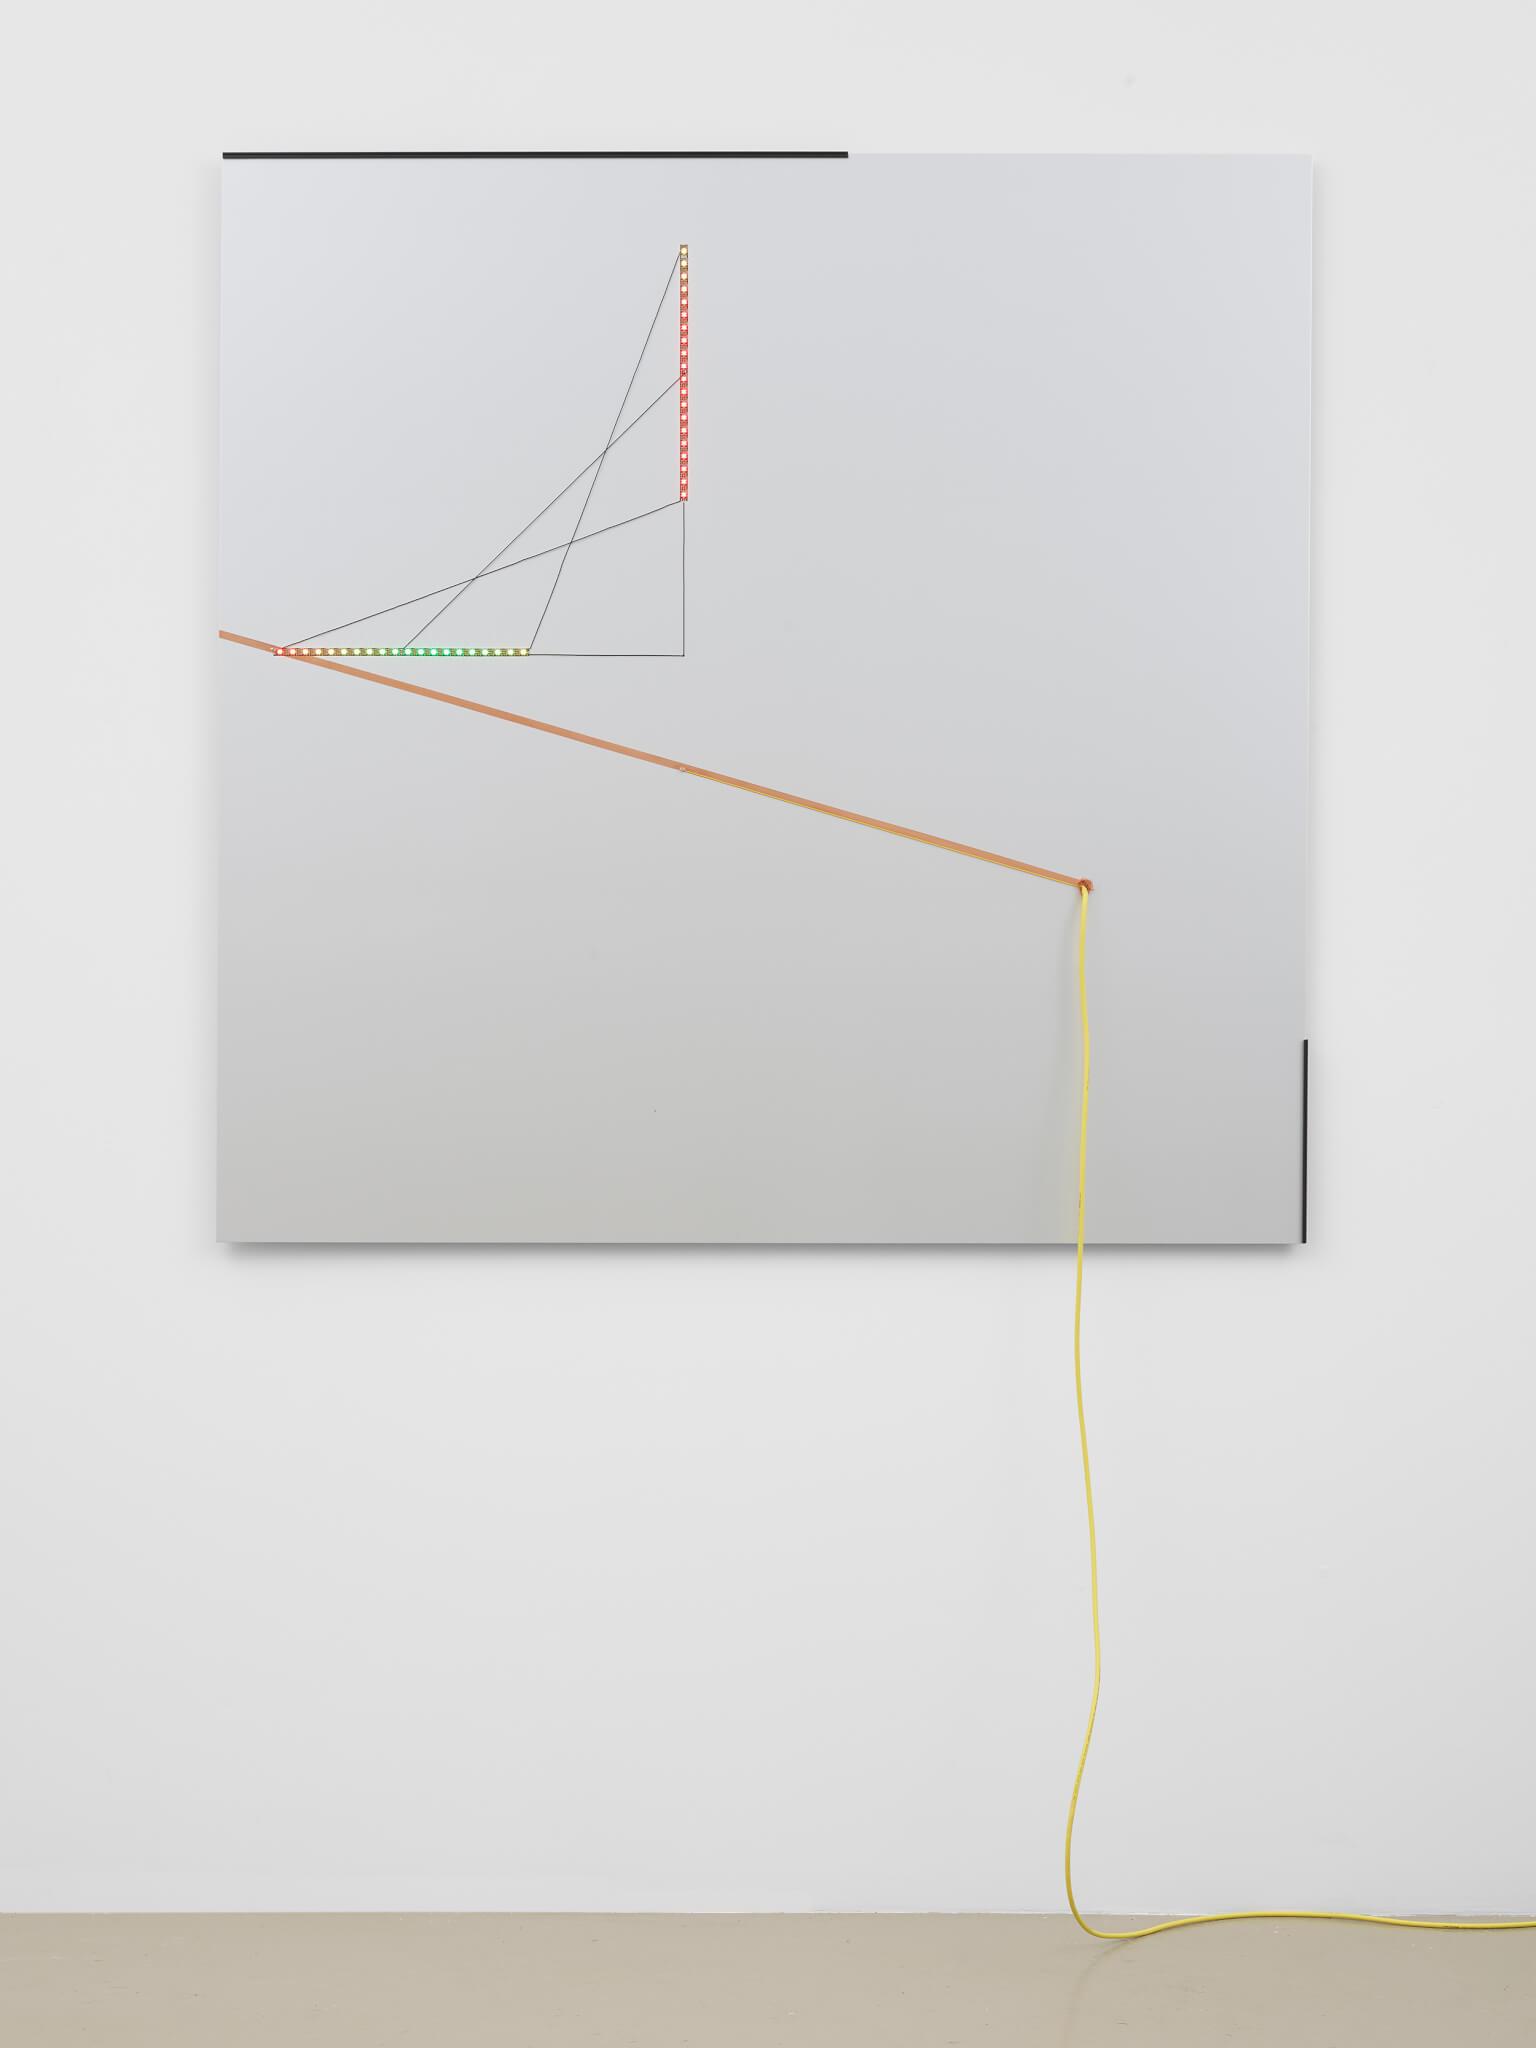 Mirza, LED Circuit Composition 18, 2018 (HM 18.003) A